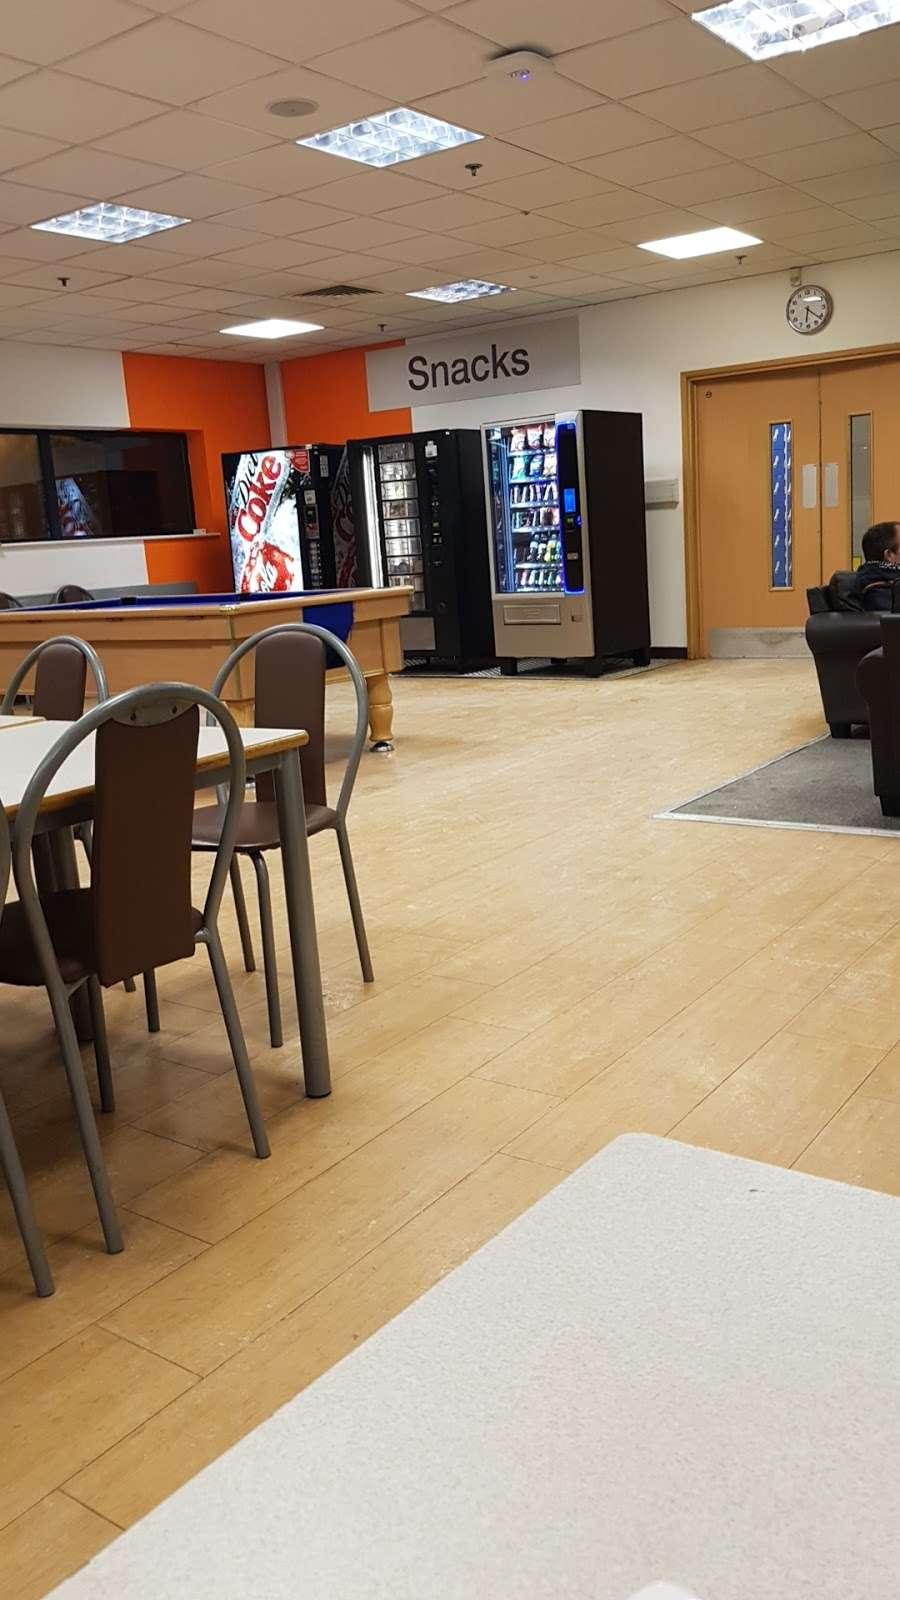 Tesco Dotcom CFC Aylesford - storage  | Photo 1 of 5 | Address: 28 Priory Park, Ditton, Aylesford ME20 7PP, UK | Phone: 01622 700400